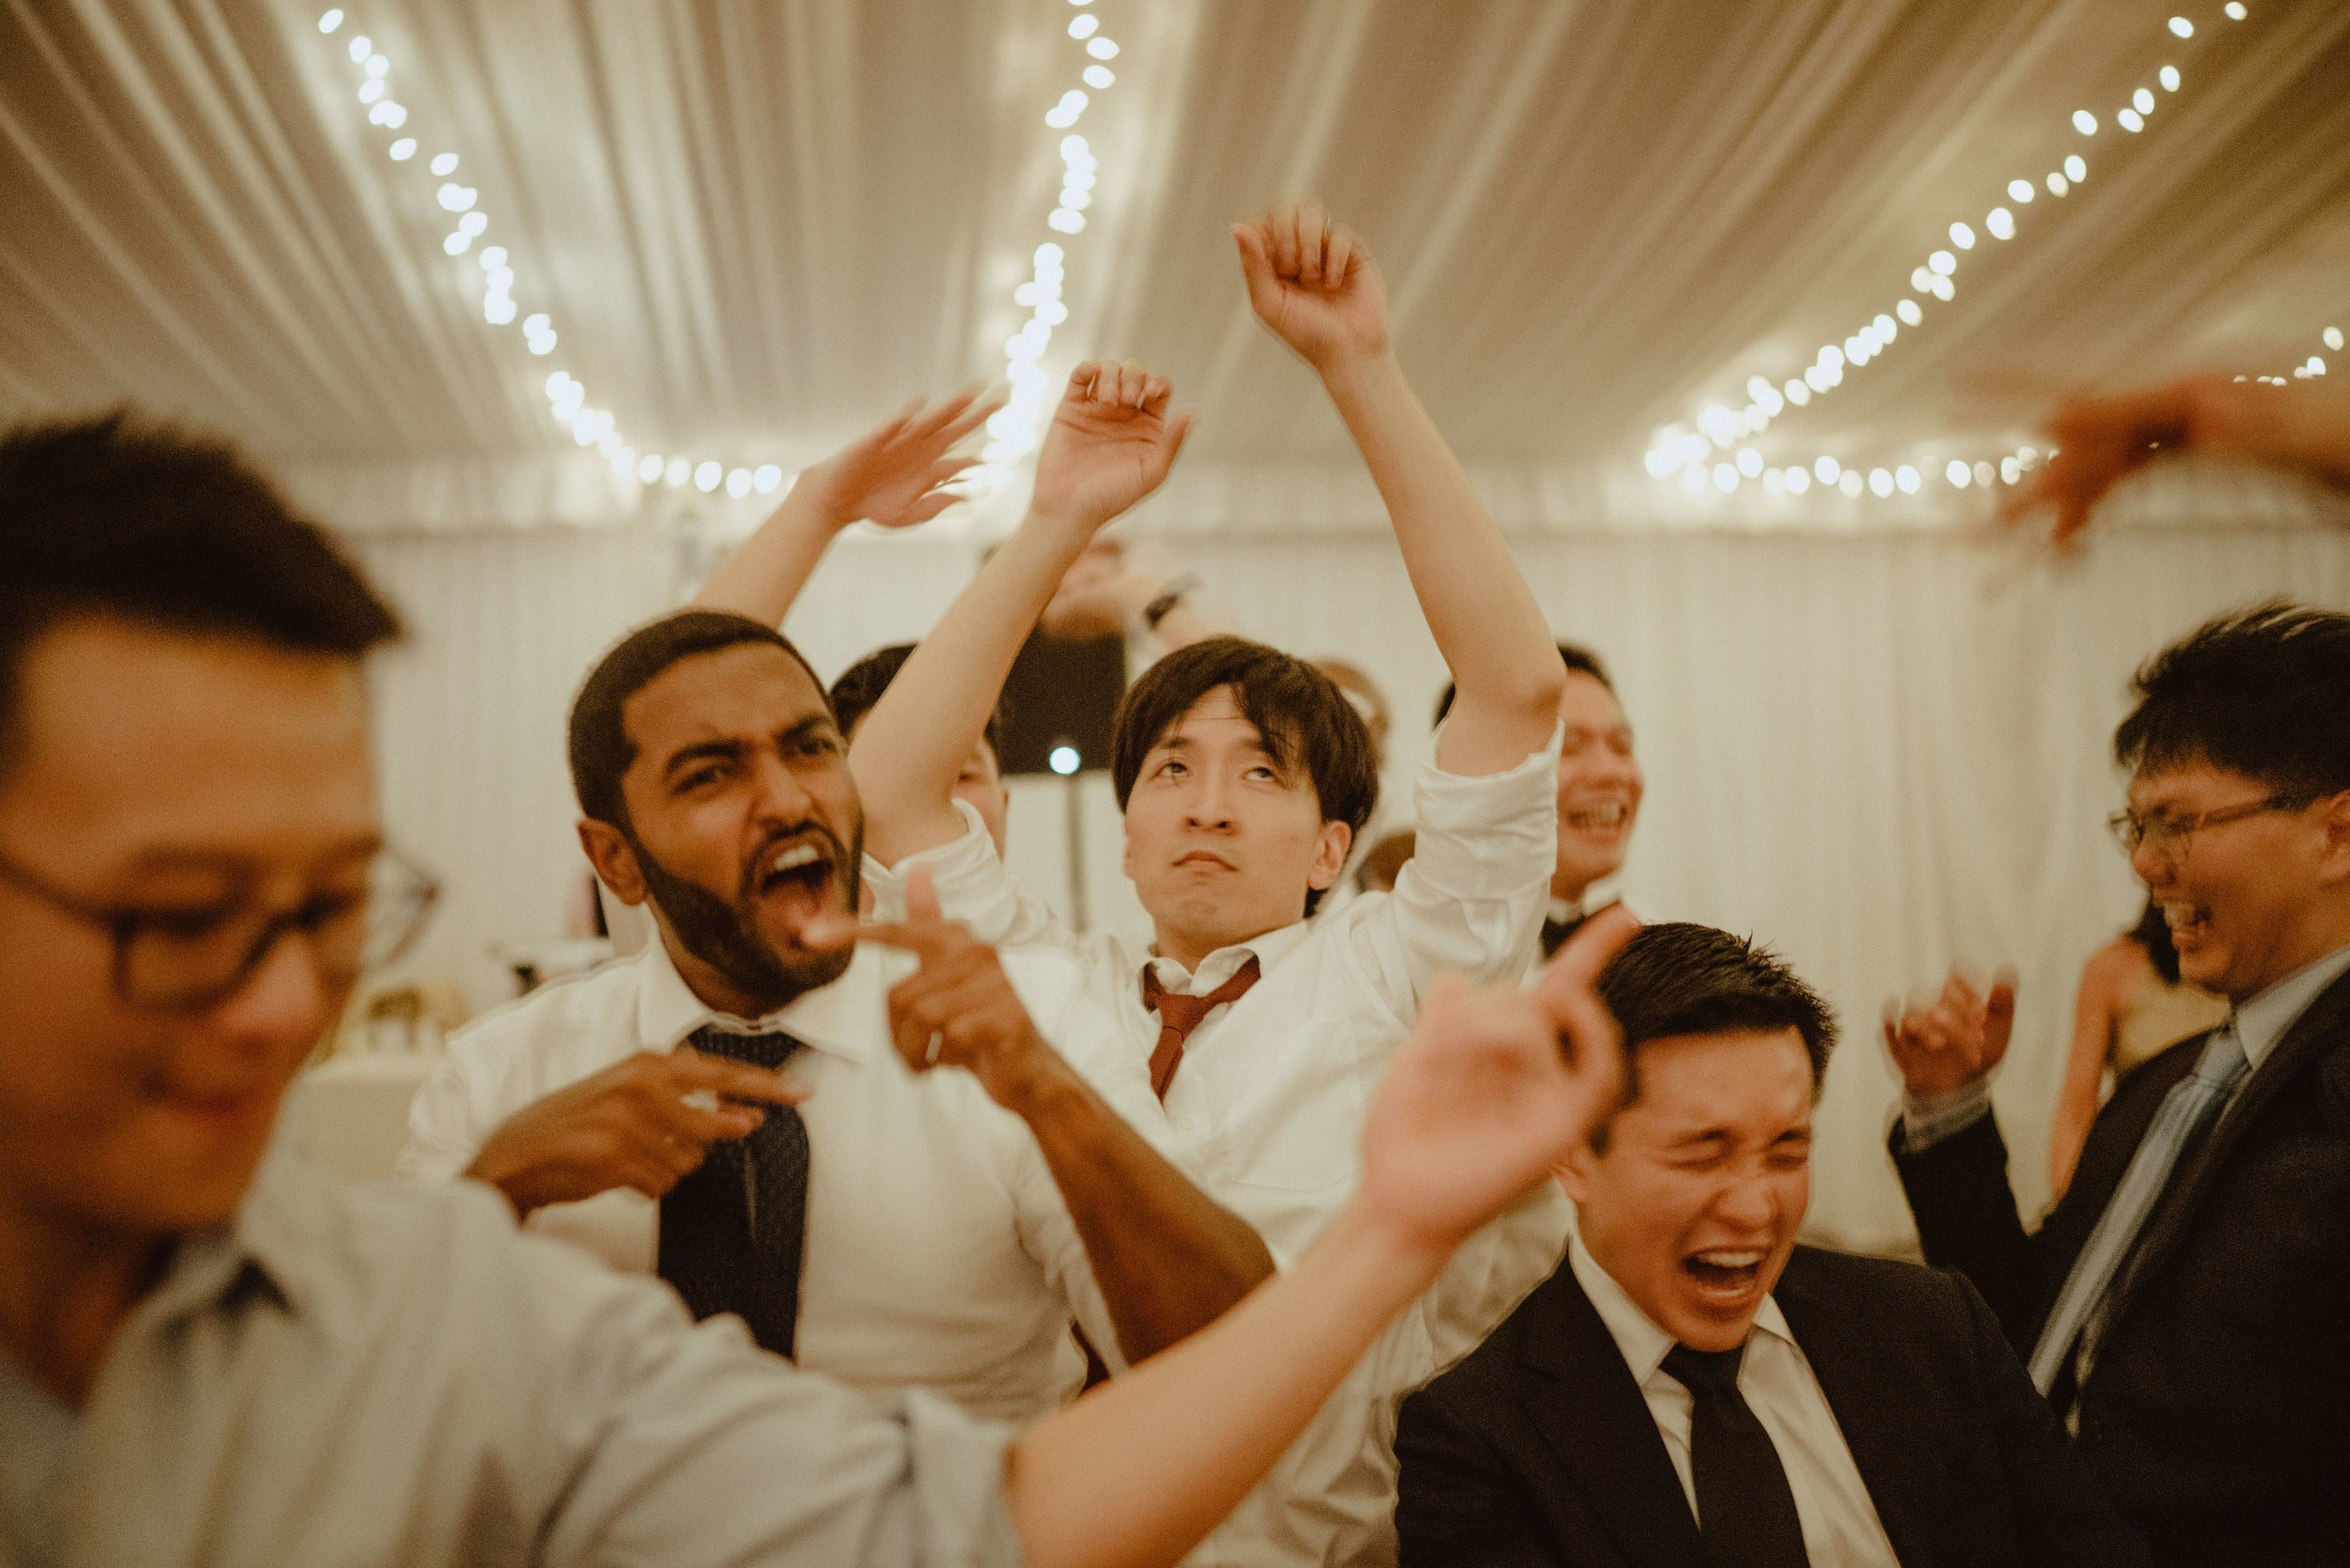 Irene-and-Jae-2019_Brooklyn_Wedding_Photographer_Chellise_Michael_Photography--176.jpg